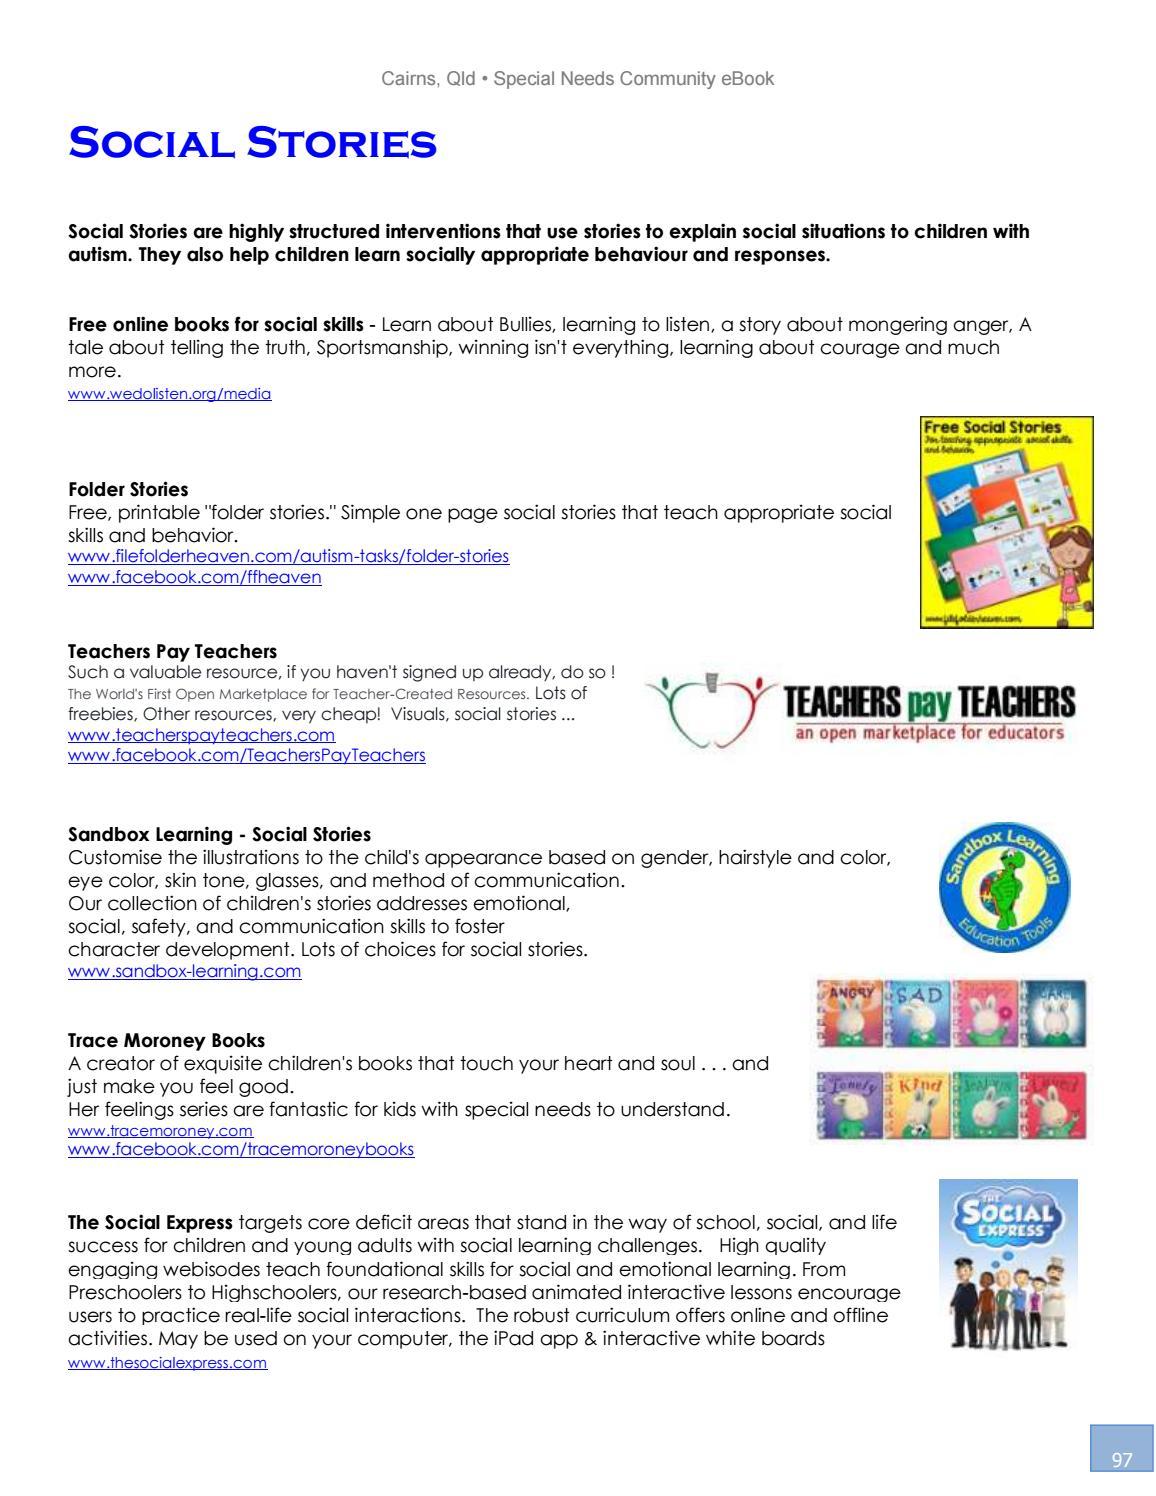 Cairns Special Needs Community Ebook 2017-2018 Editionheidi - Issuu - Free Printable Social Skills Stories For Children